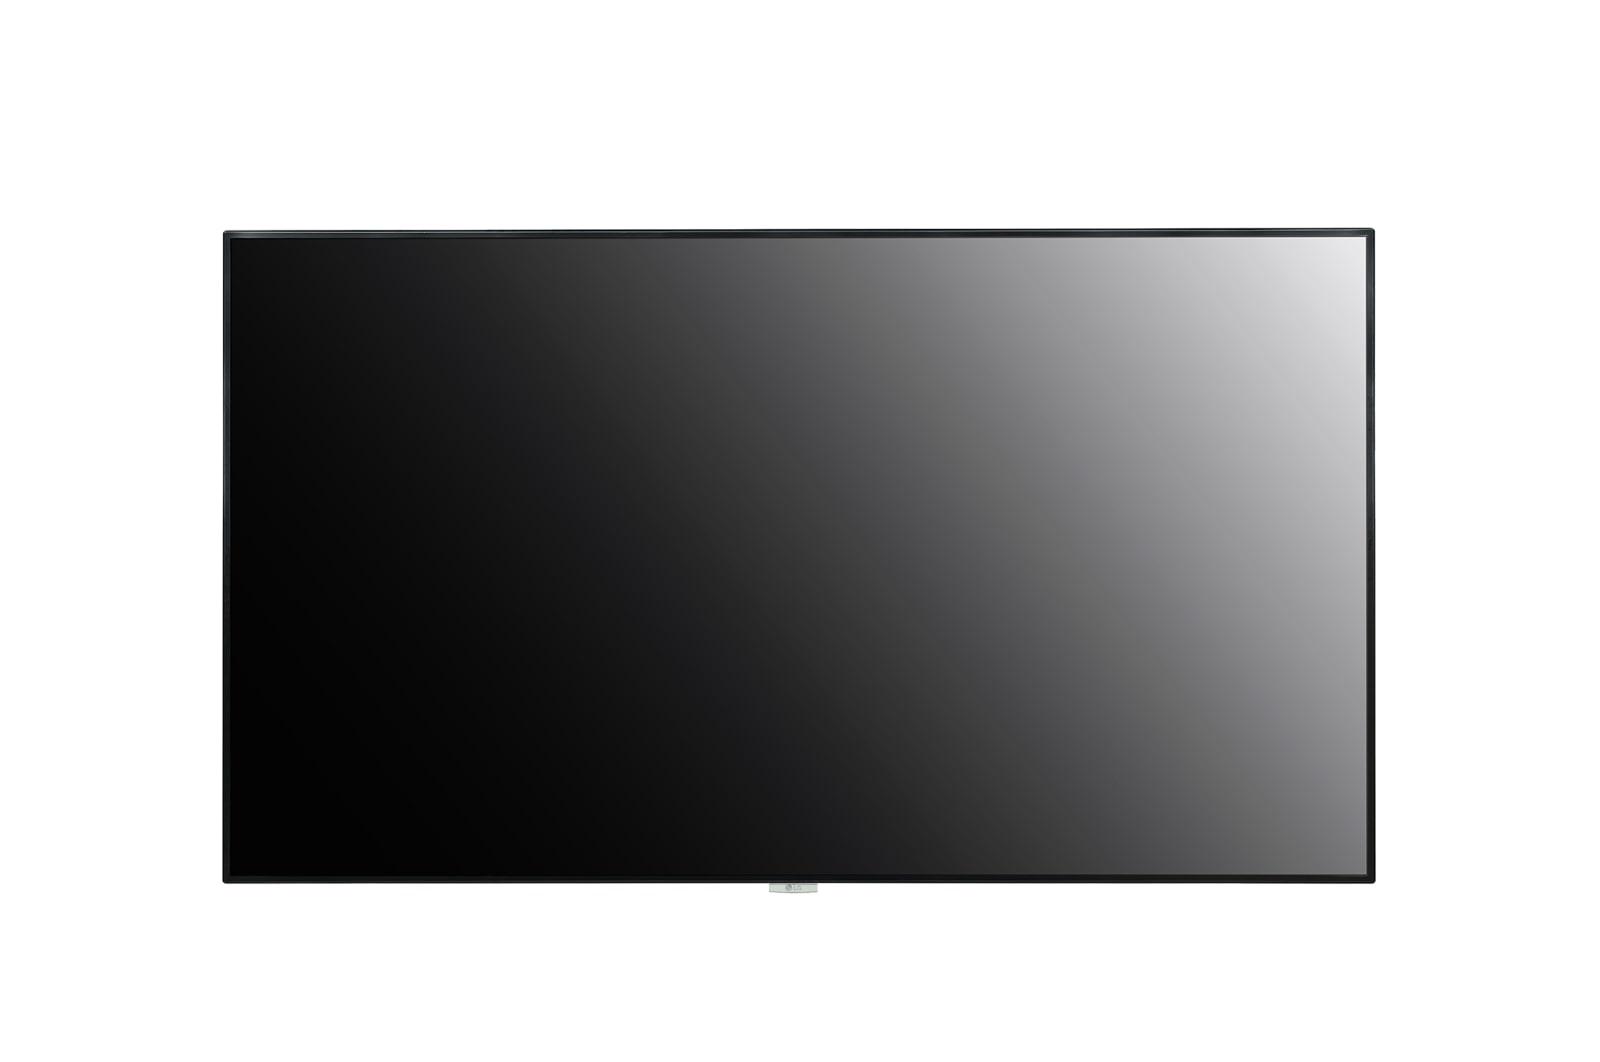 LG - Profissional / Digital Signage 98P IPS UHD - 98UH5F-H IPS UHD